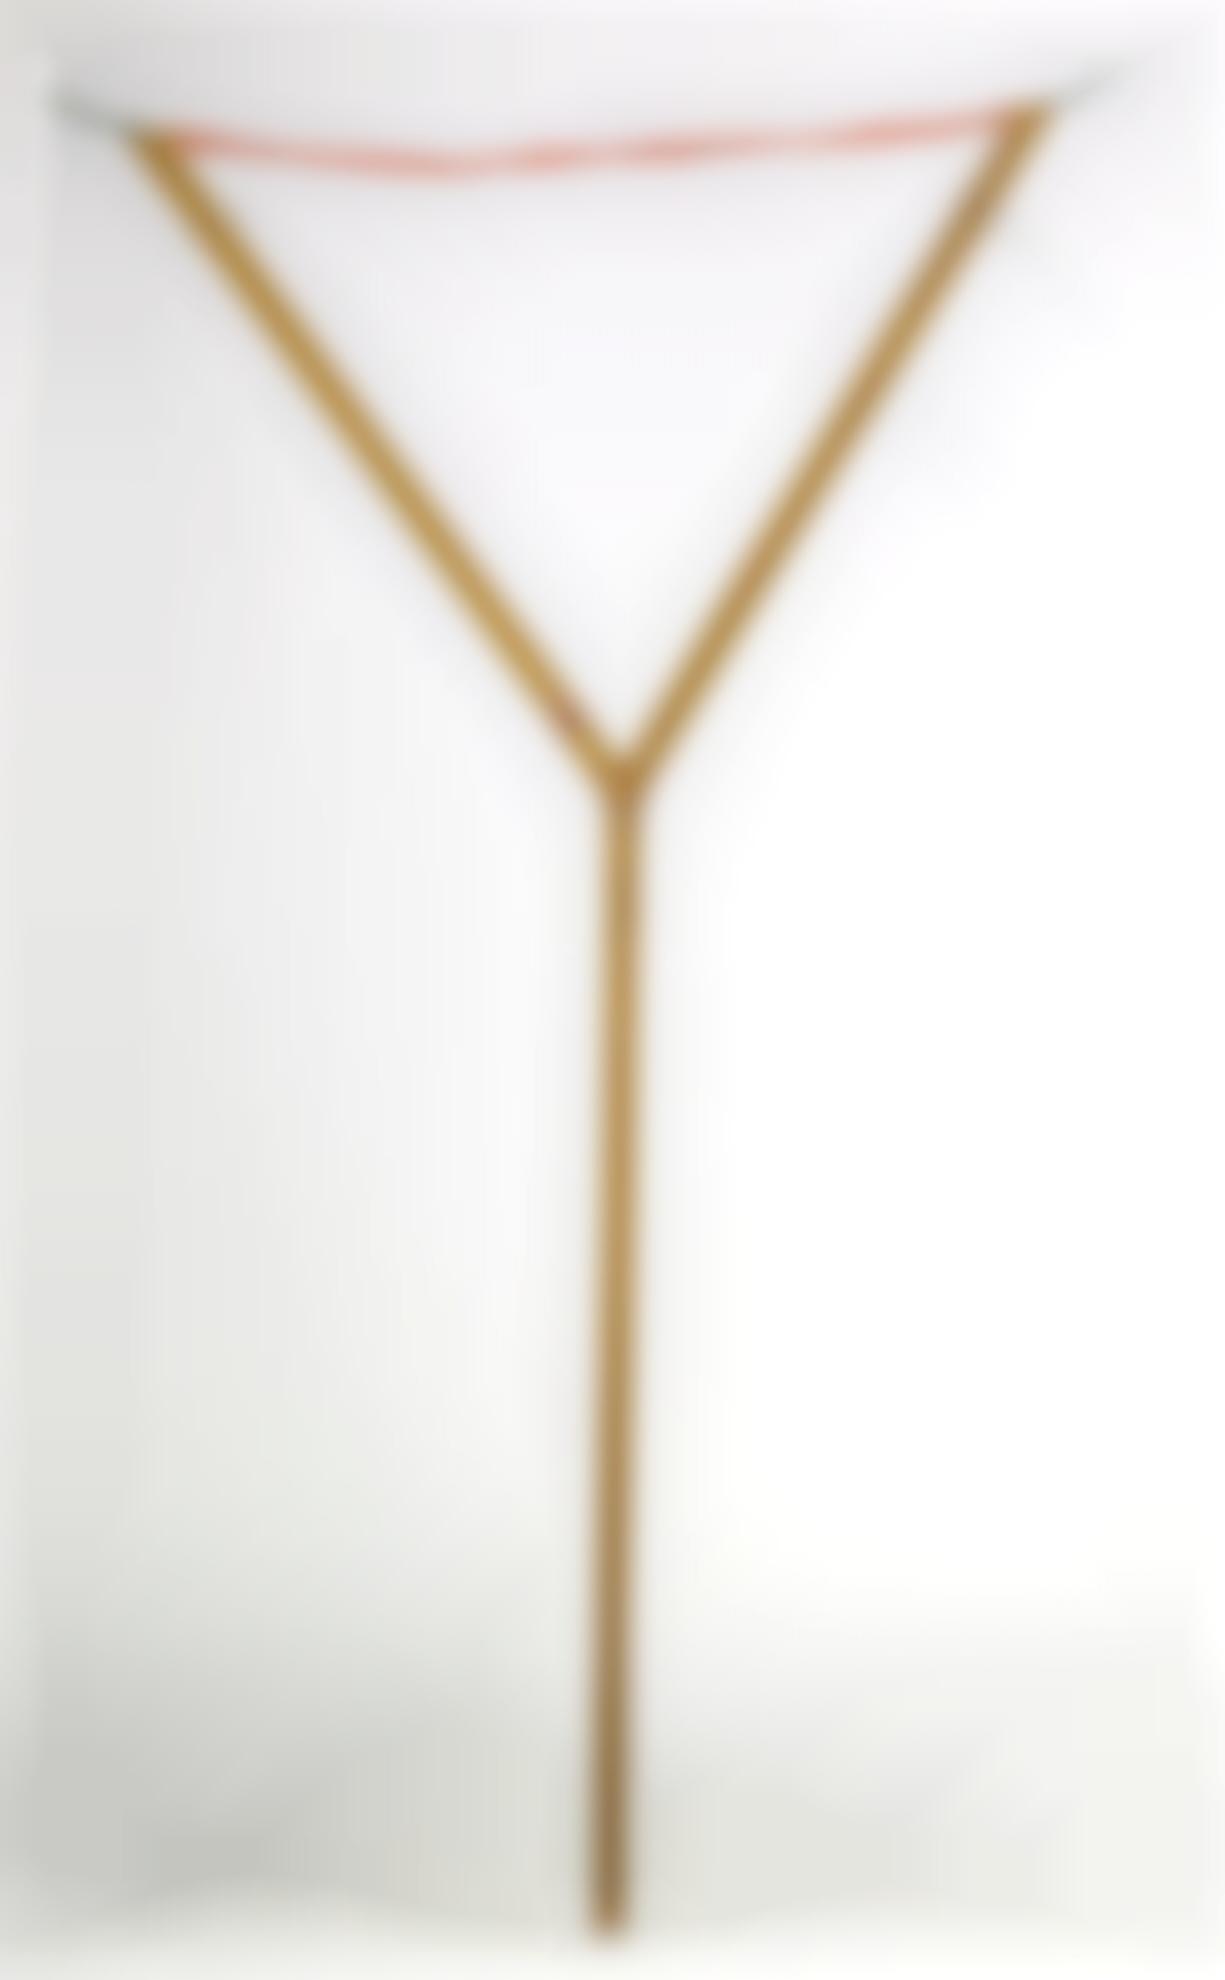 Martial Raysse-Symbole Y-1974